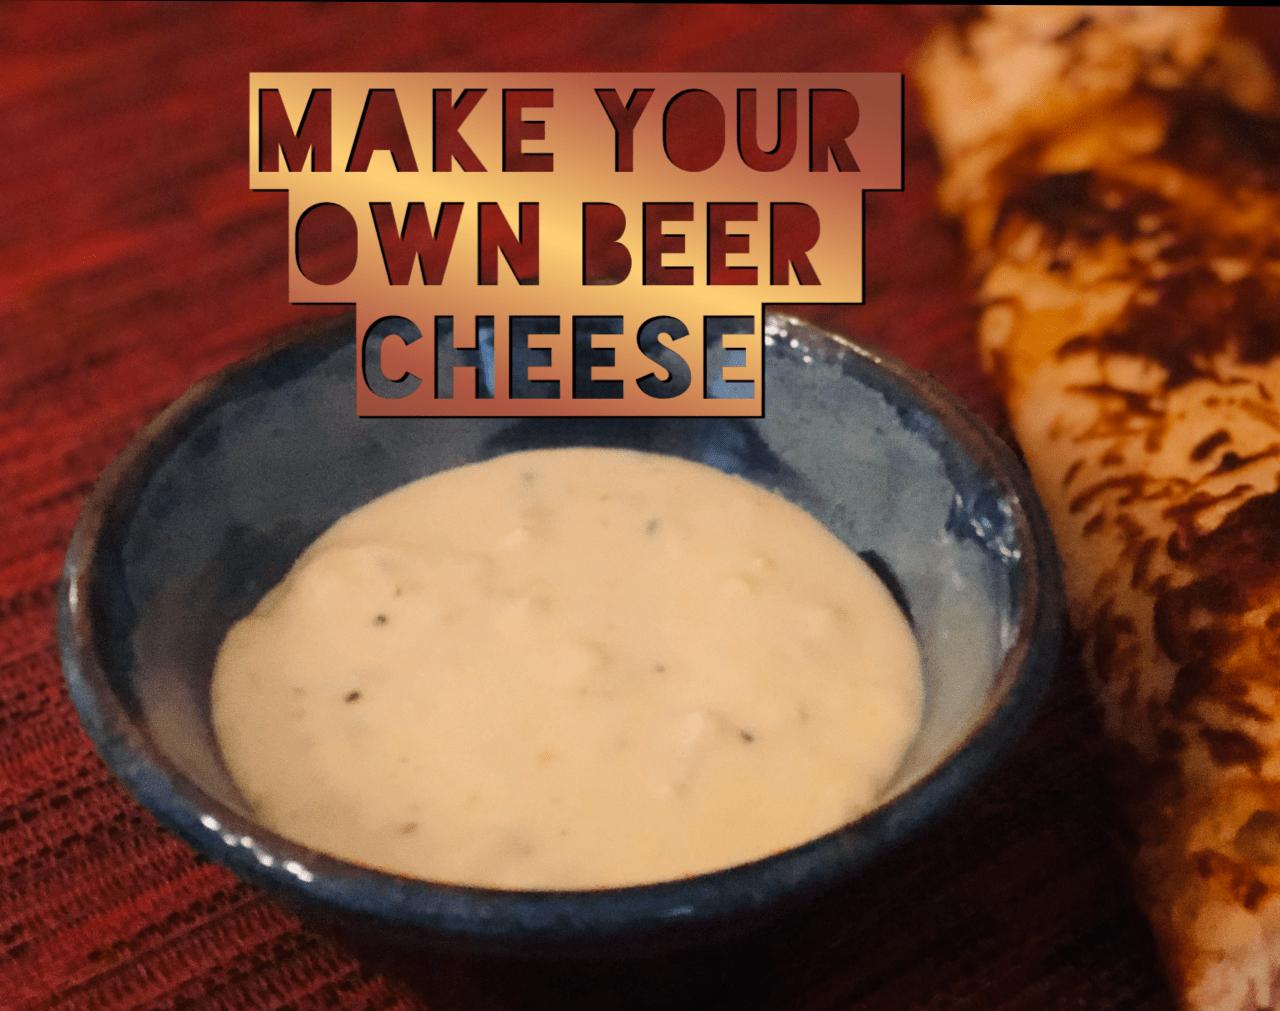 Beer cheese, Kochkaese, Schmelzkaese